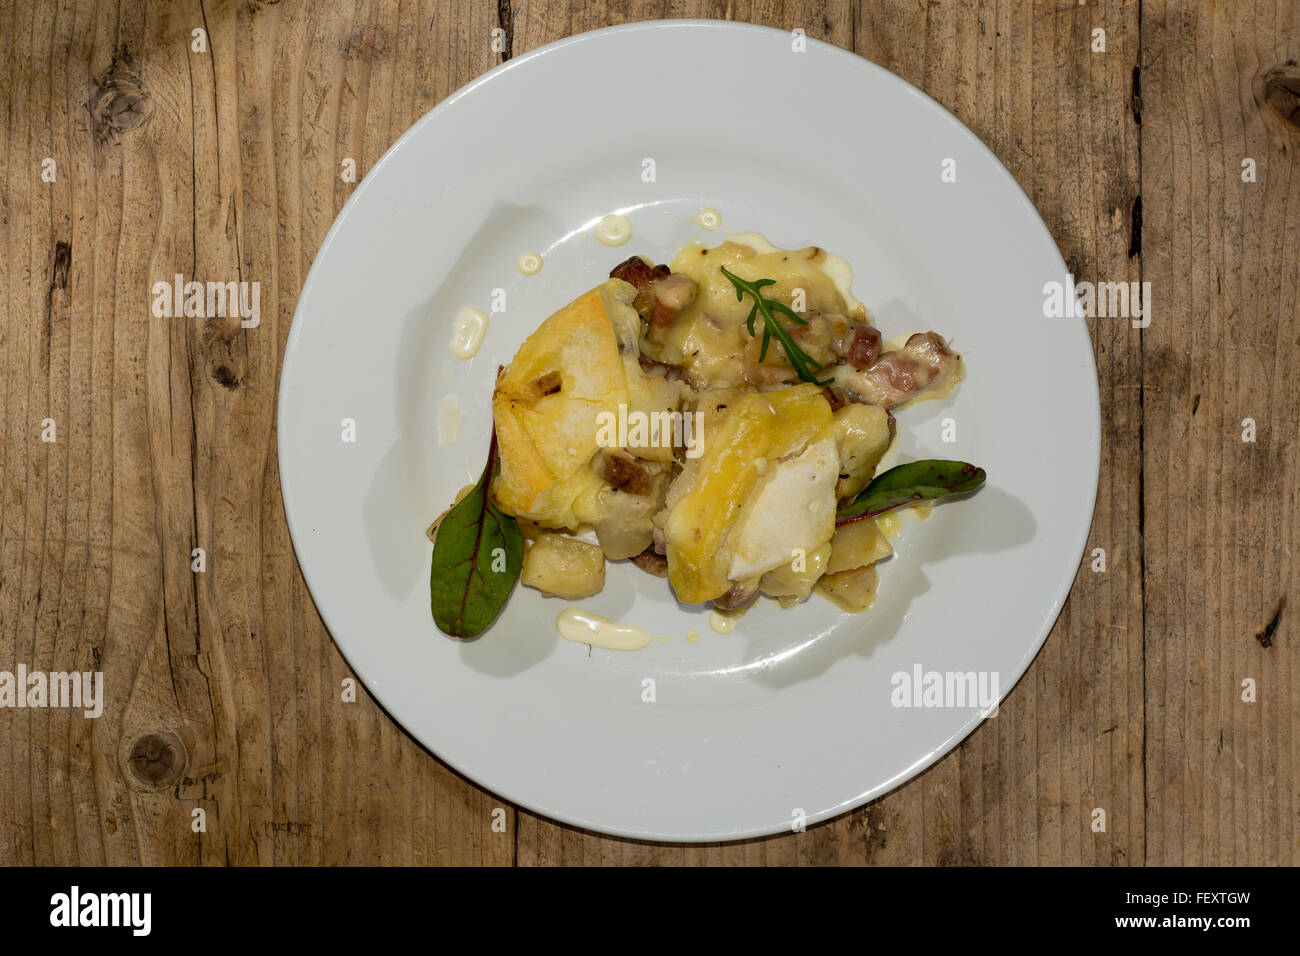 Savoie tartiflette. French dish made with potatoes, reblochon cheese, lardons and onions - Stock Image